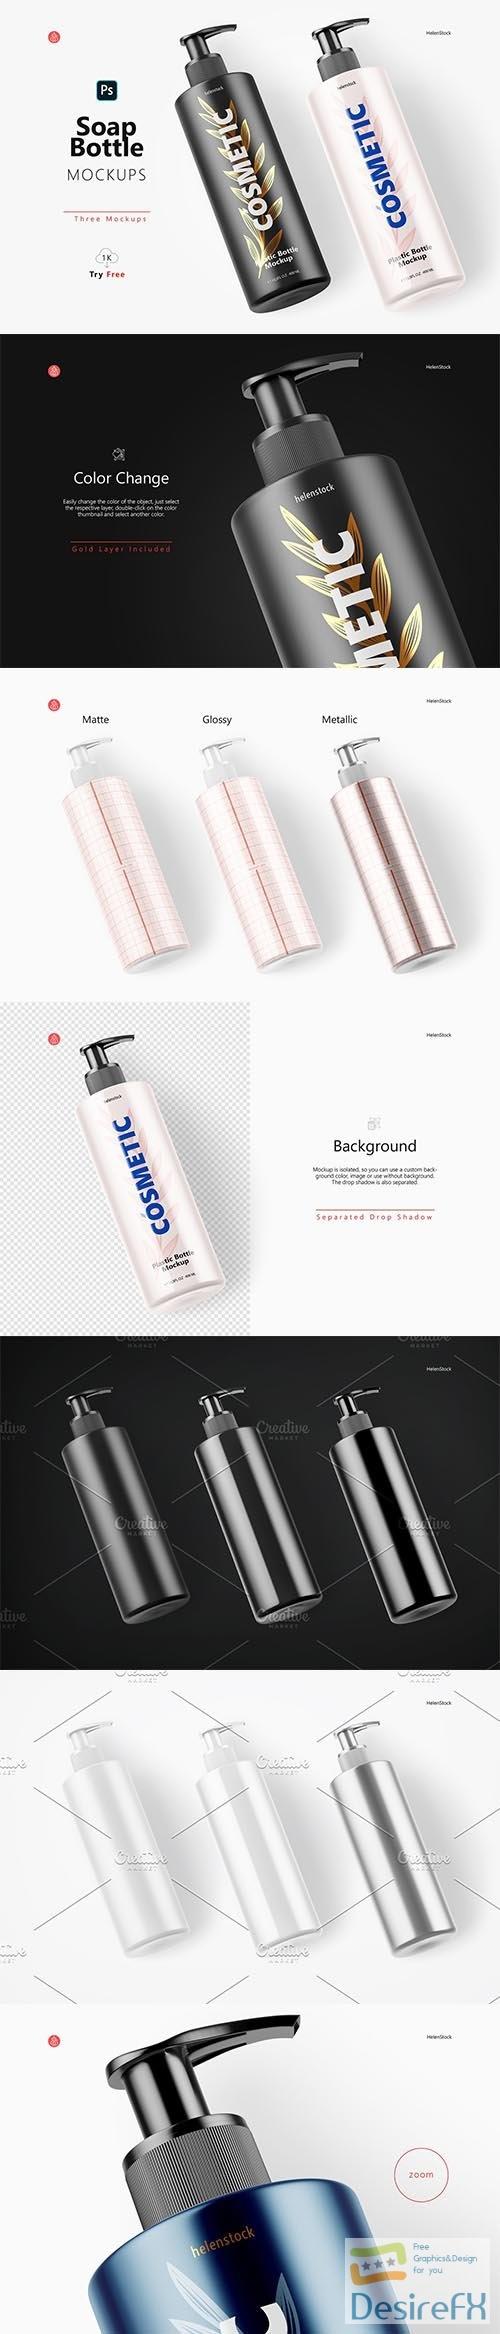 CreativeMarket - Soap Bottle Mockup - Halfside View 5444713